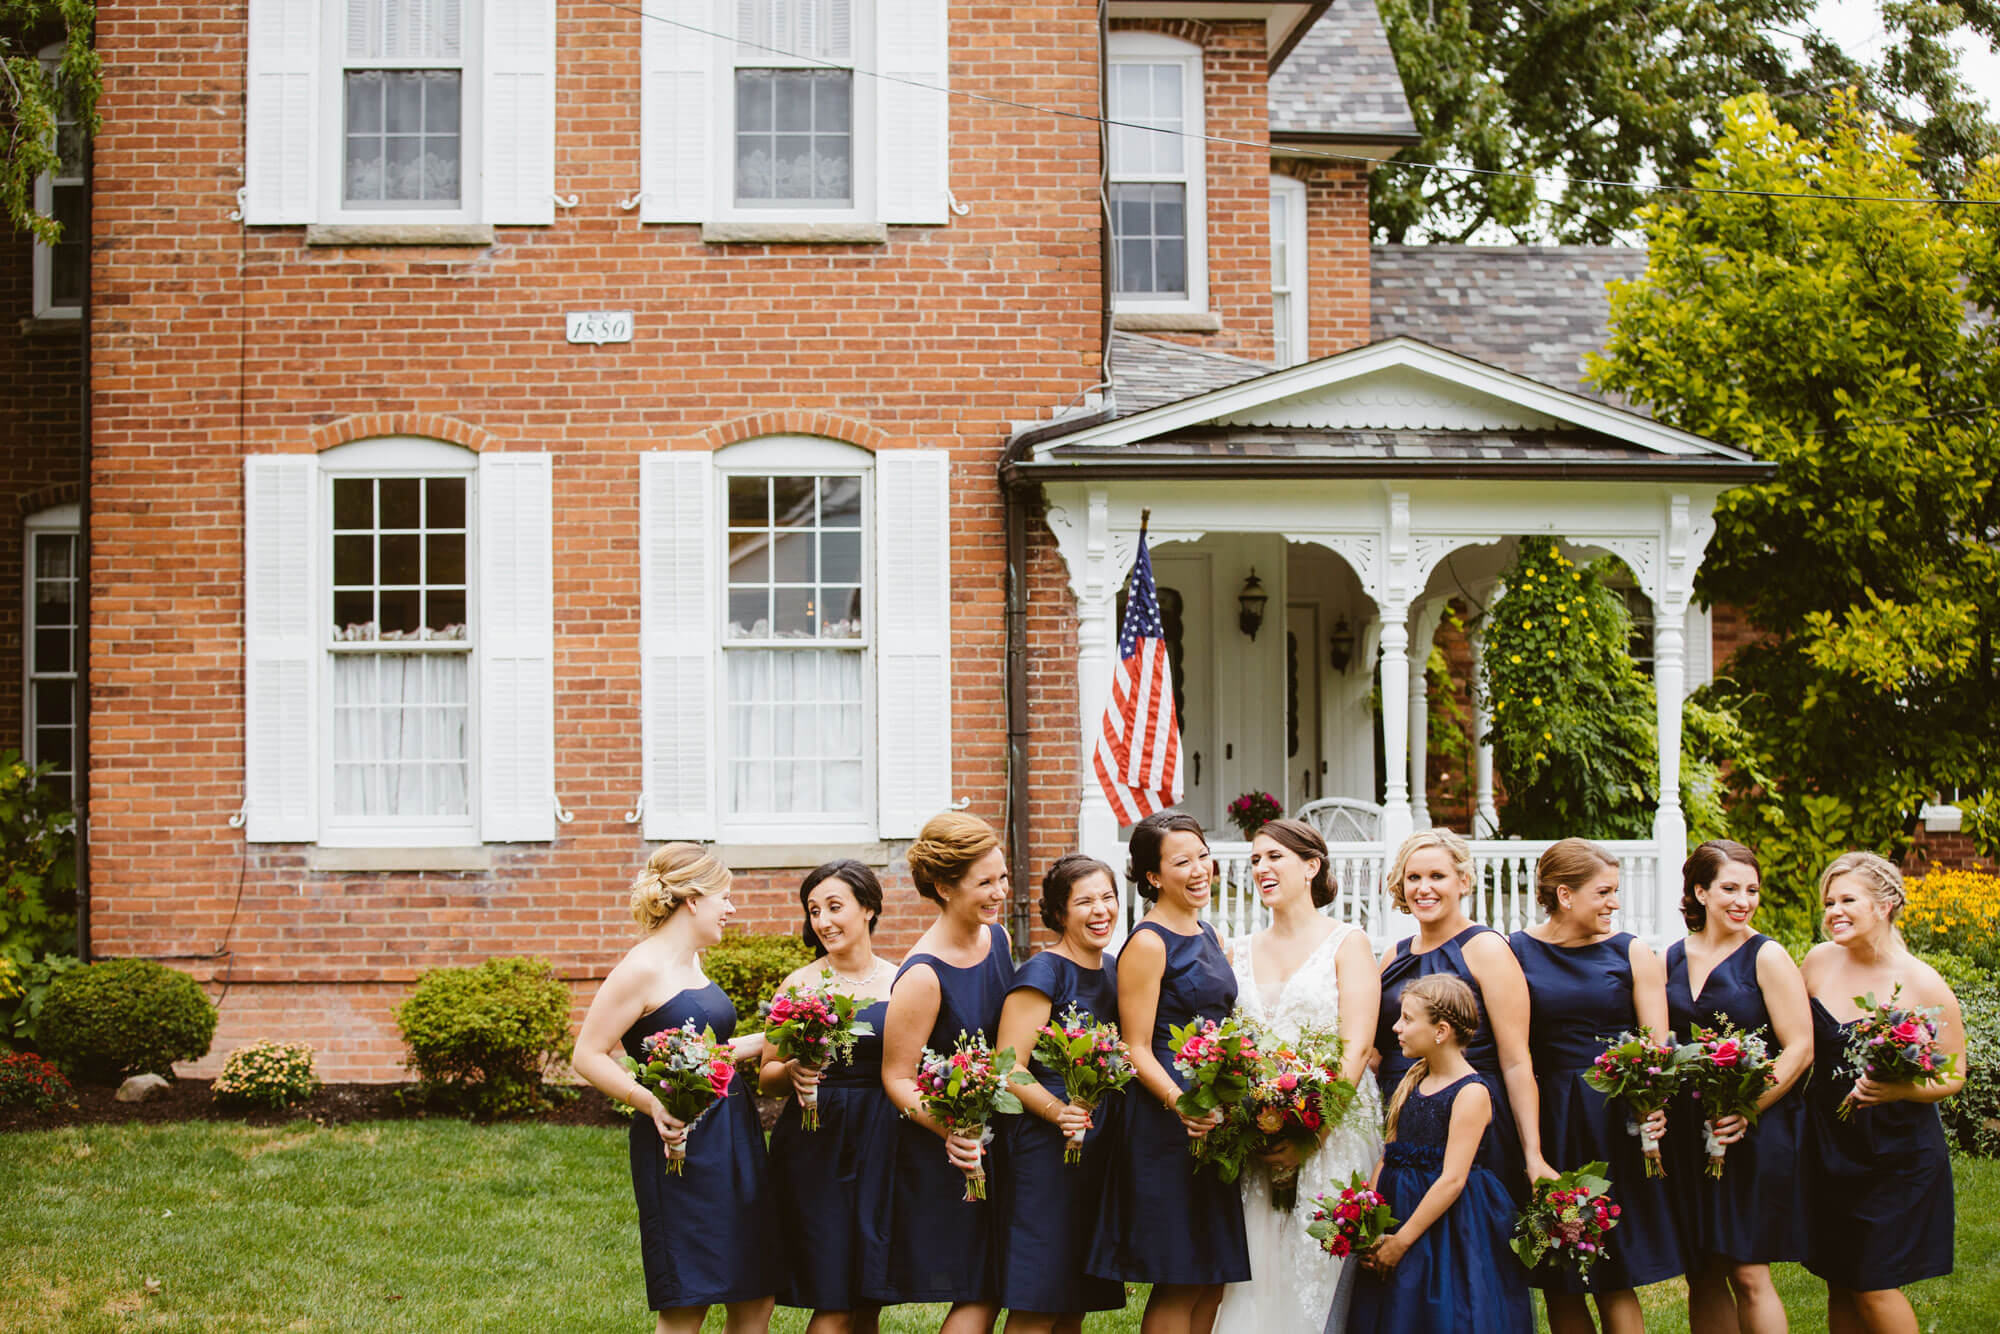 Erica-Kay-Photography---Kate-_-Joe-Wedding-17.jpg